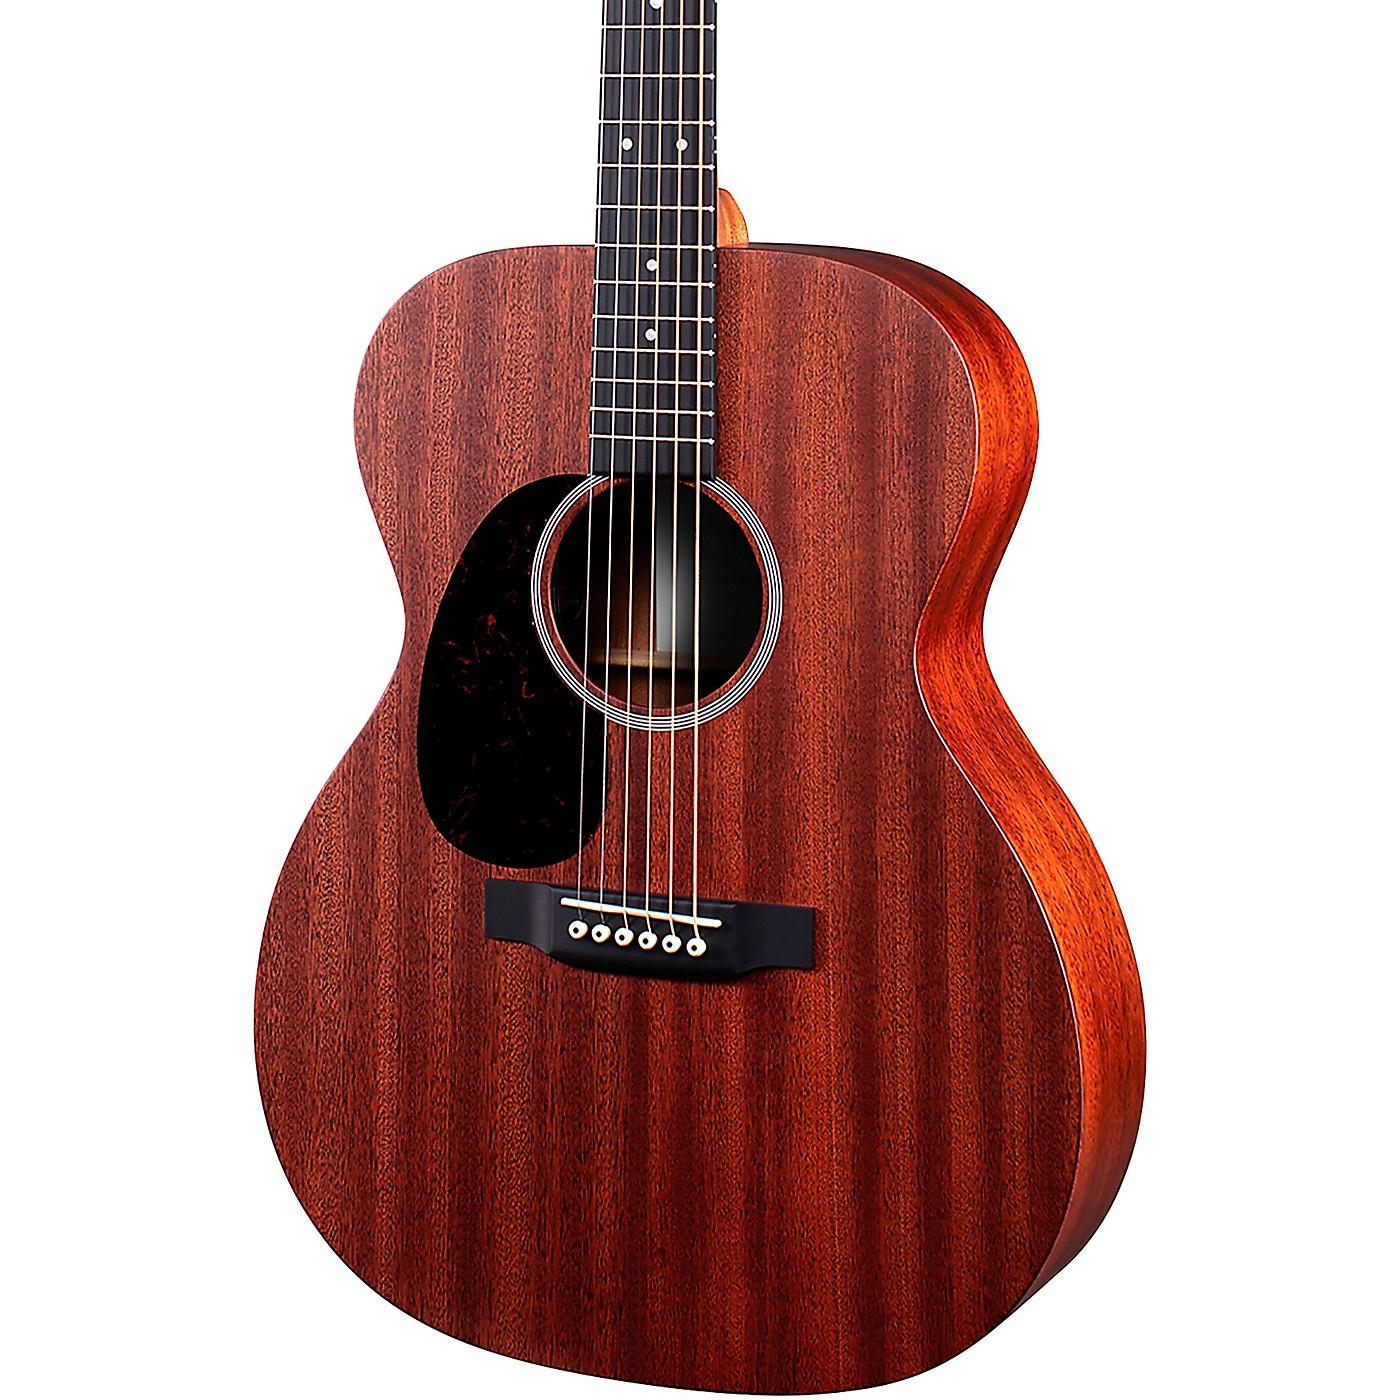 Martin 000-10EL Road Series Dreadnought Acoustic-Electric Guitar thumbnail